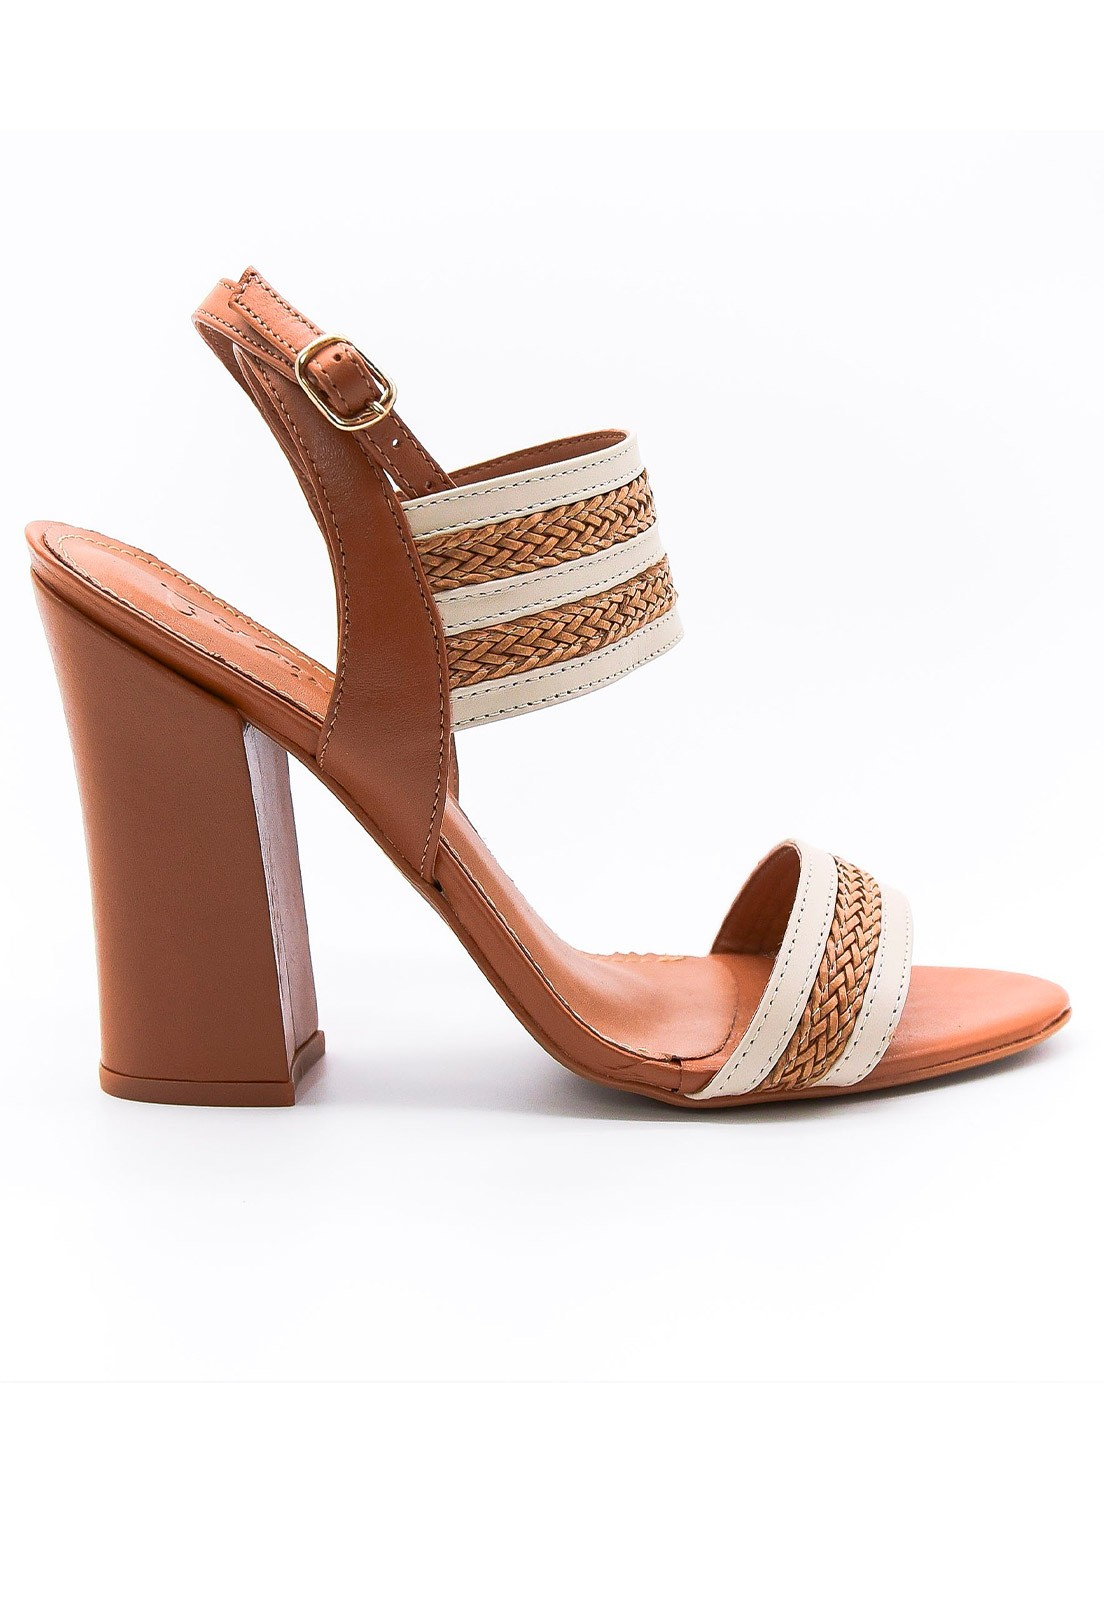 Sandália couro caramelo Lavine